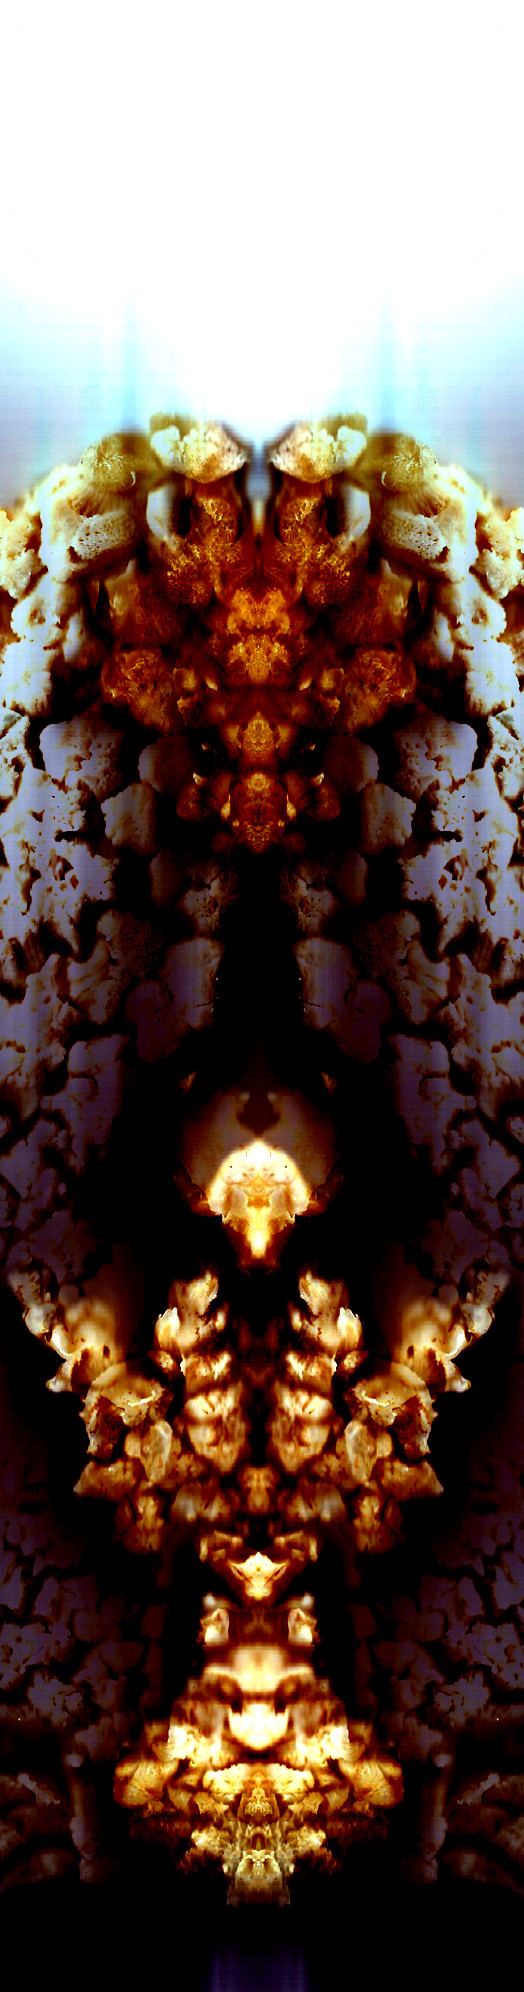 Nature Patterns -Internal Caves.jpg